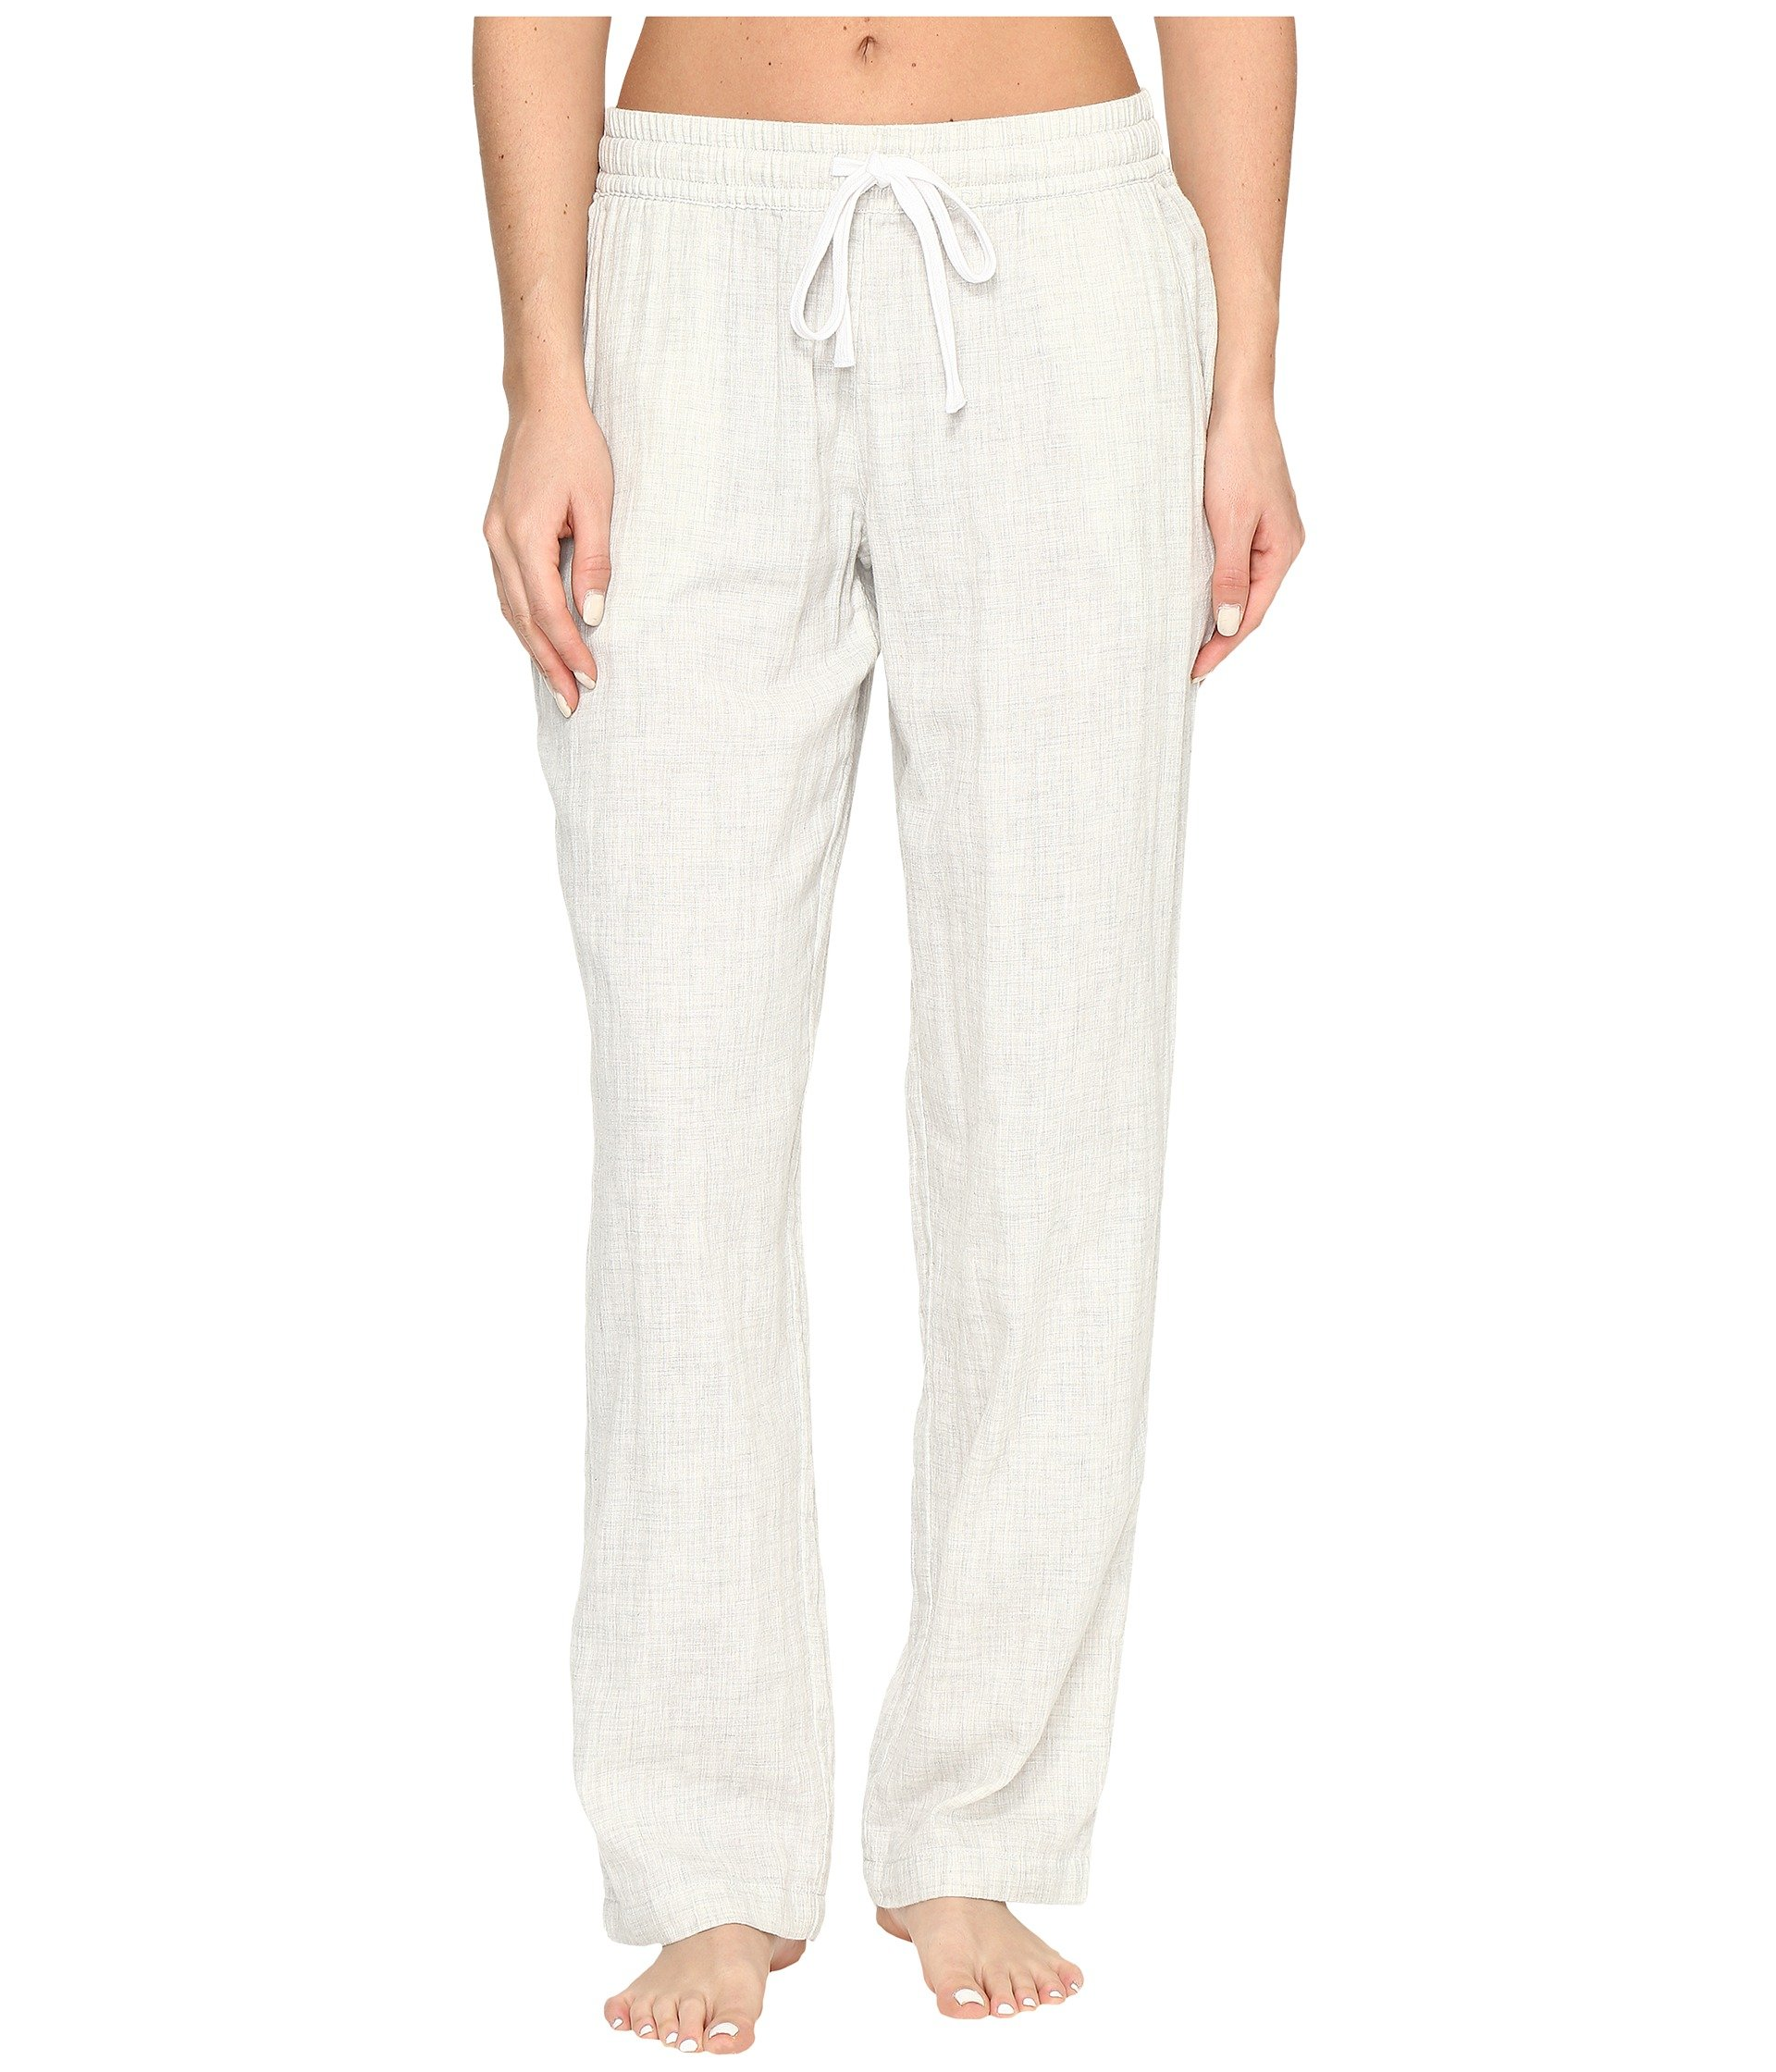 Pantalón de Pijama para Mujer UGG Ashland Pants  + UGG en VeoyCompro.net